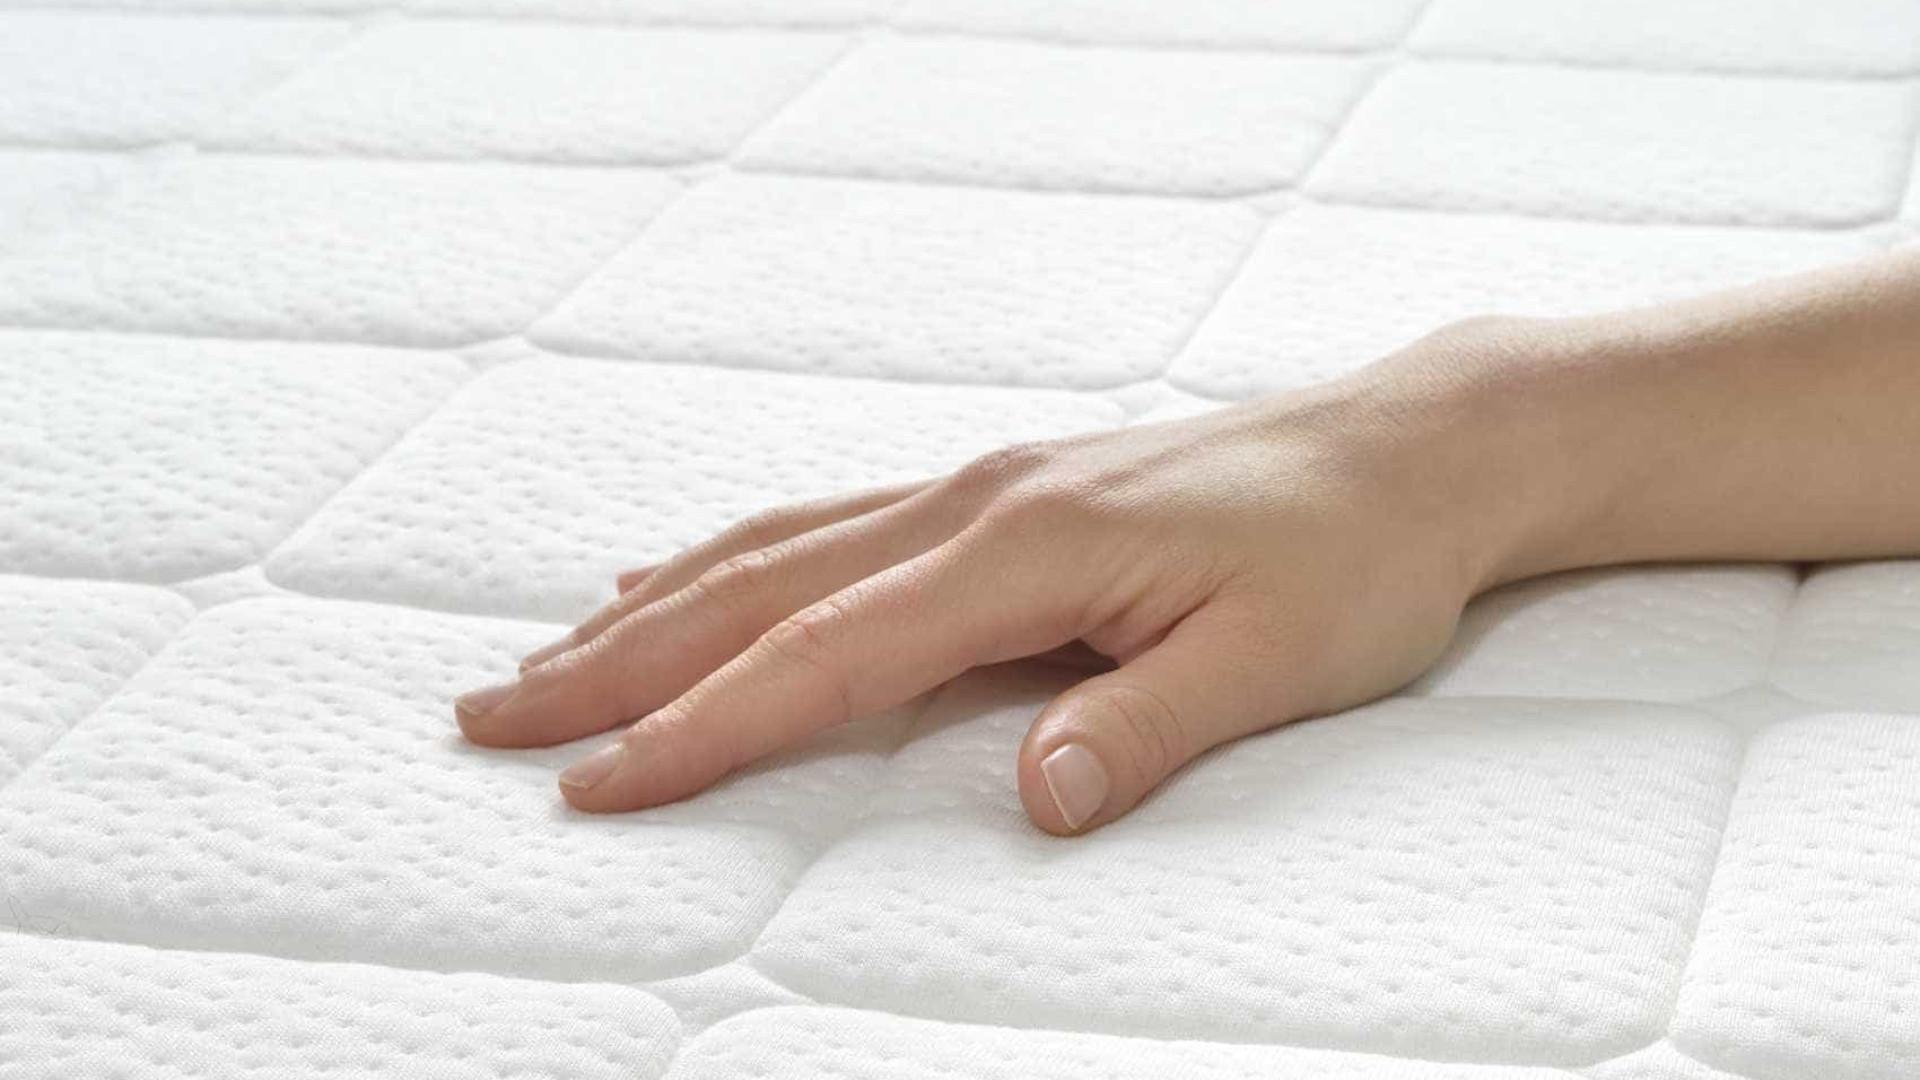 10 dicas caseiras para tirar manchas e cheiros do colchão